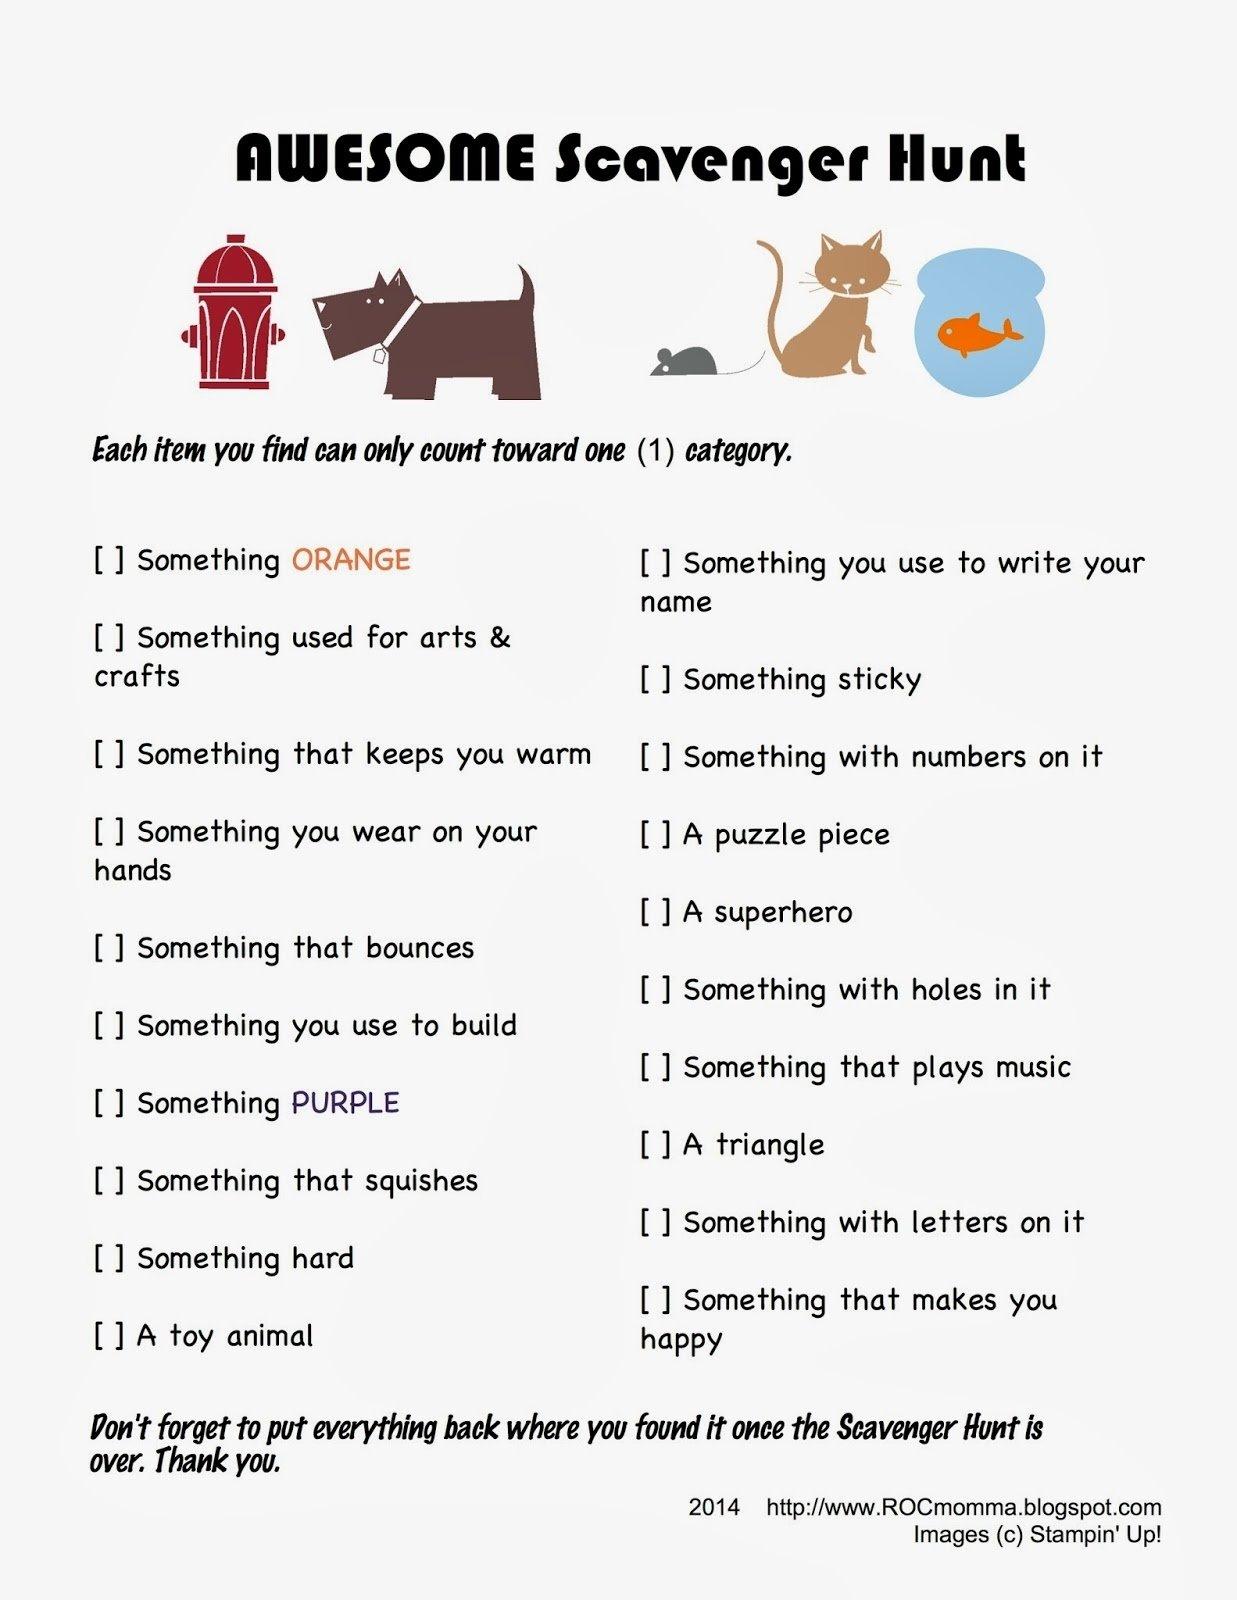 10 Amazing Treasure Hunt Ideas For Adults rocmomma three easy no prep super fun scavenger hunts 6 2020